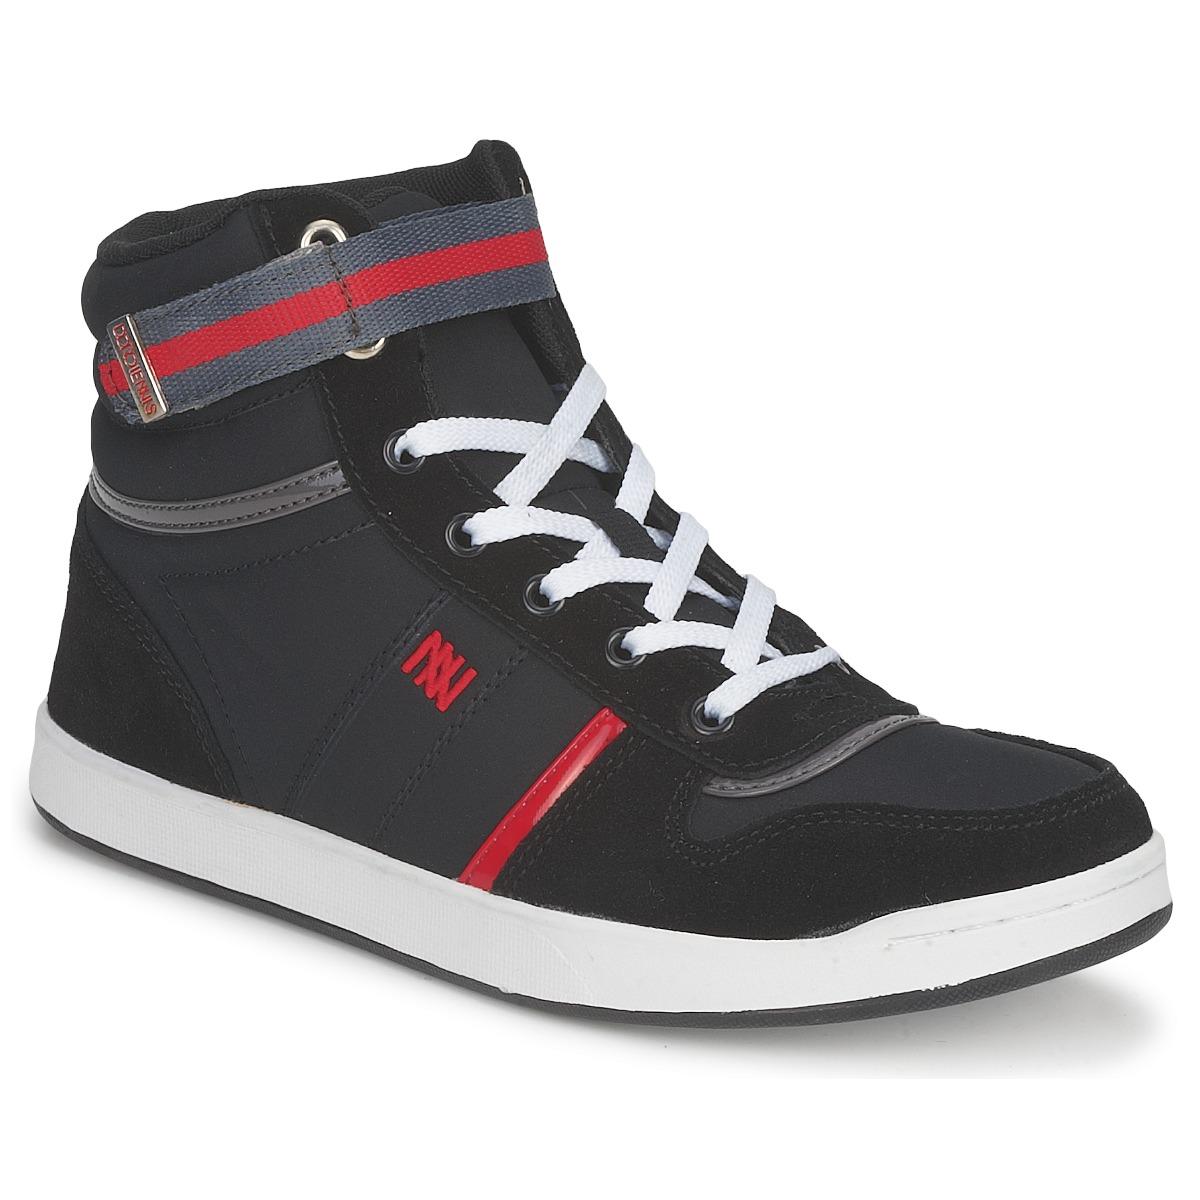 Sneakers Dorotennis  BASKET NYLON ATTACHE